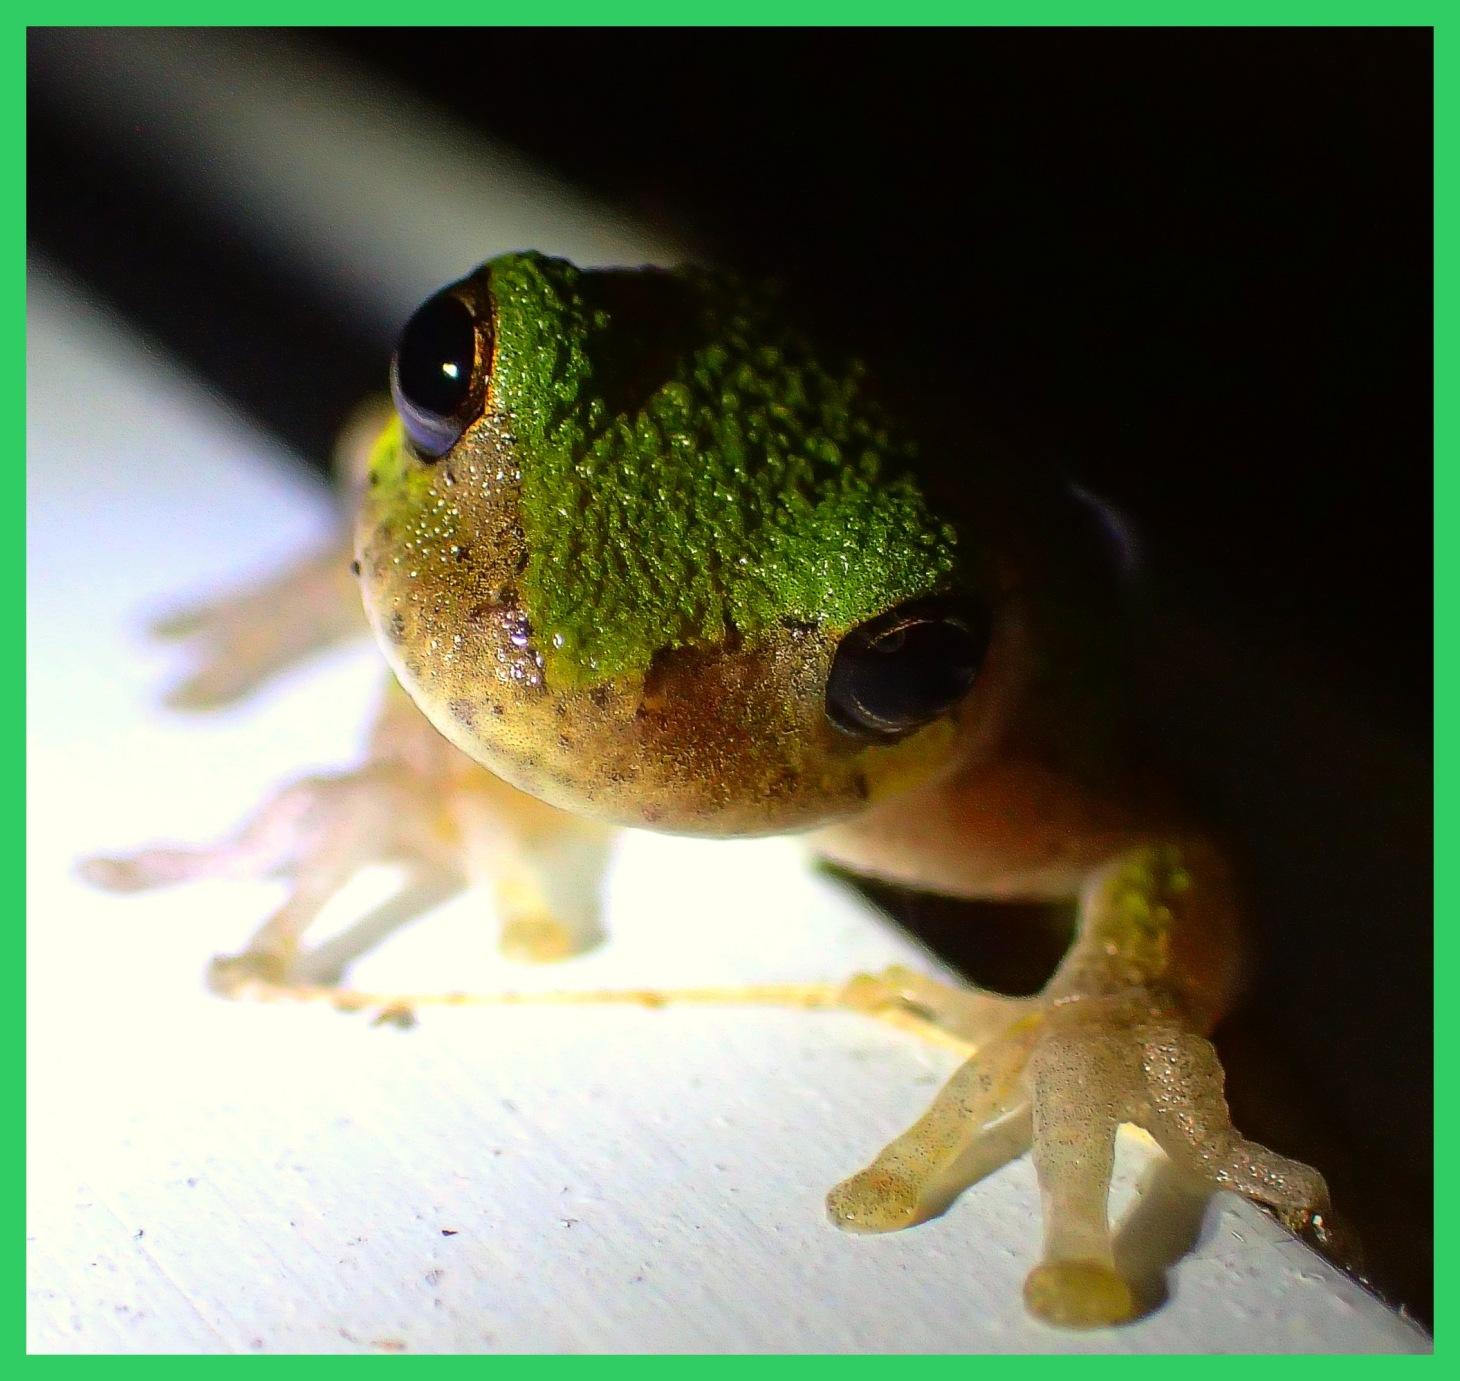 Tree Frog climbing around the porch (1). Photo by Thomas Peace c. 2015